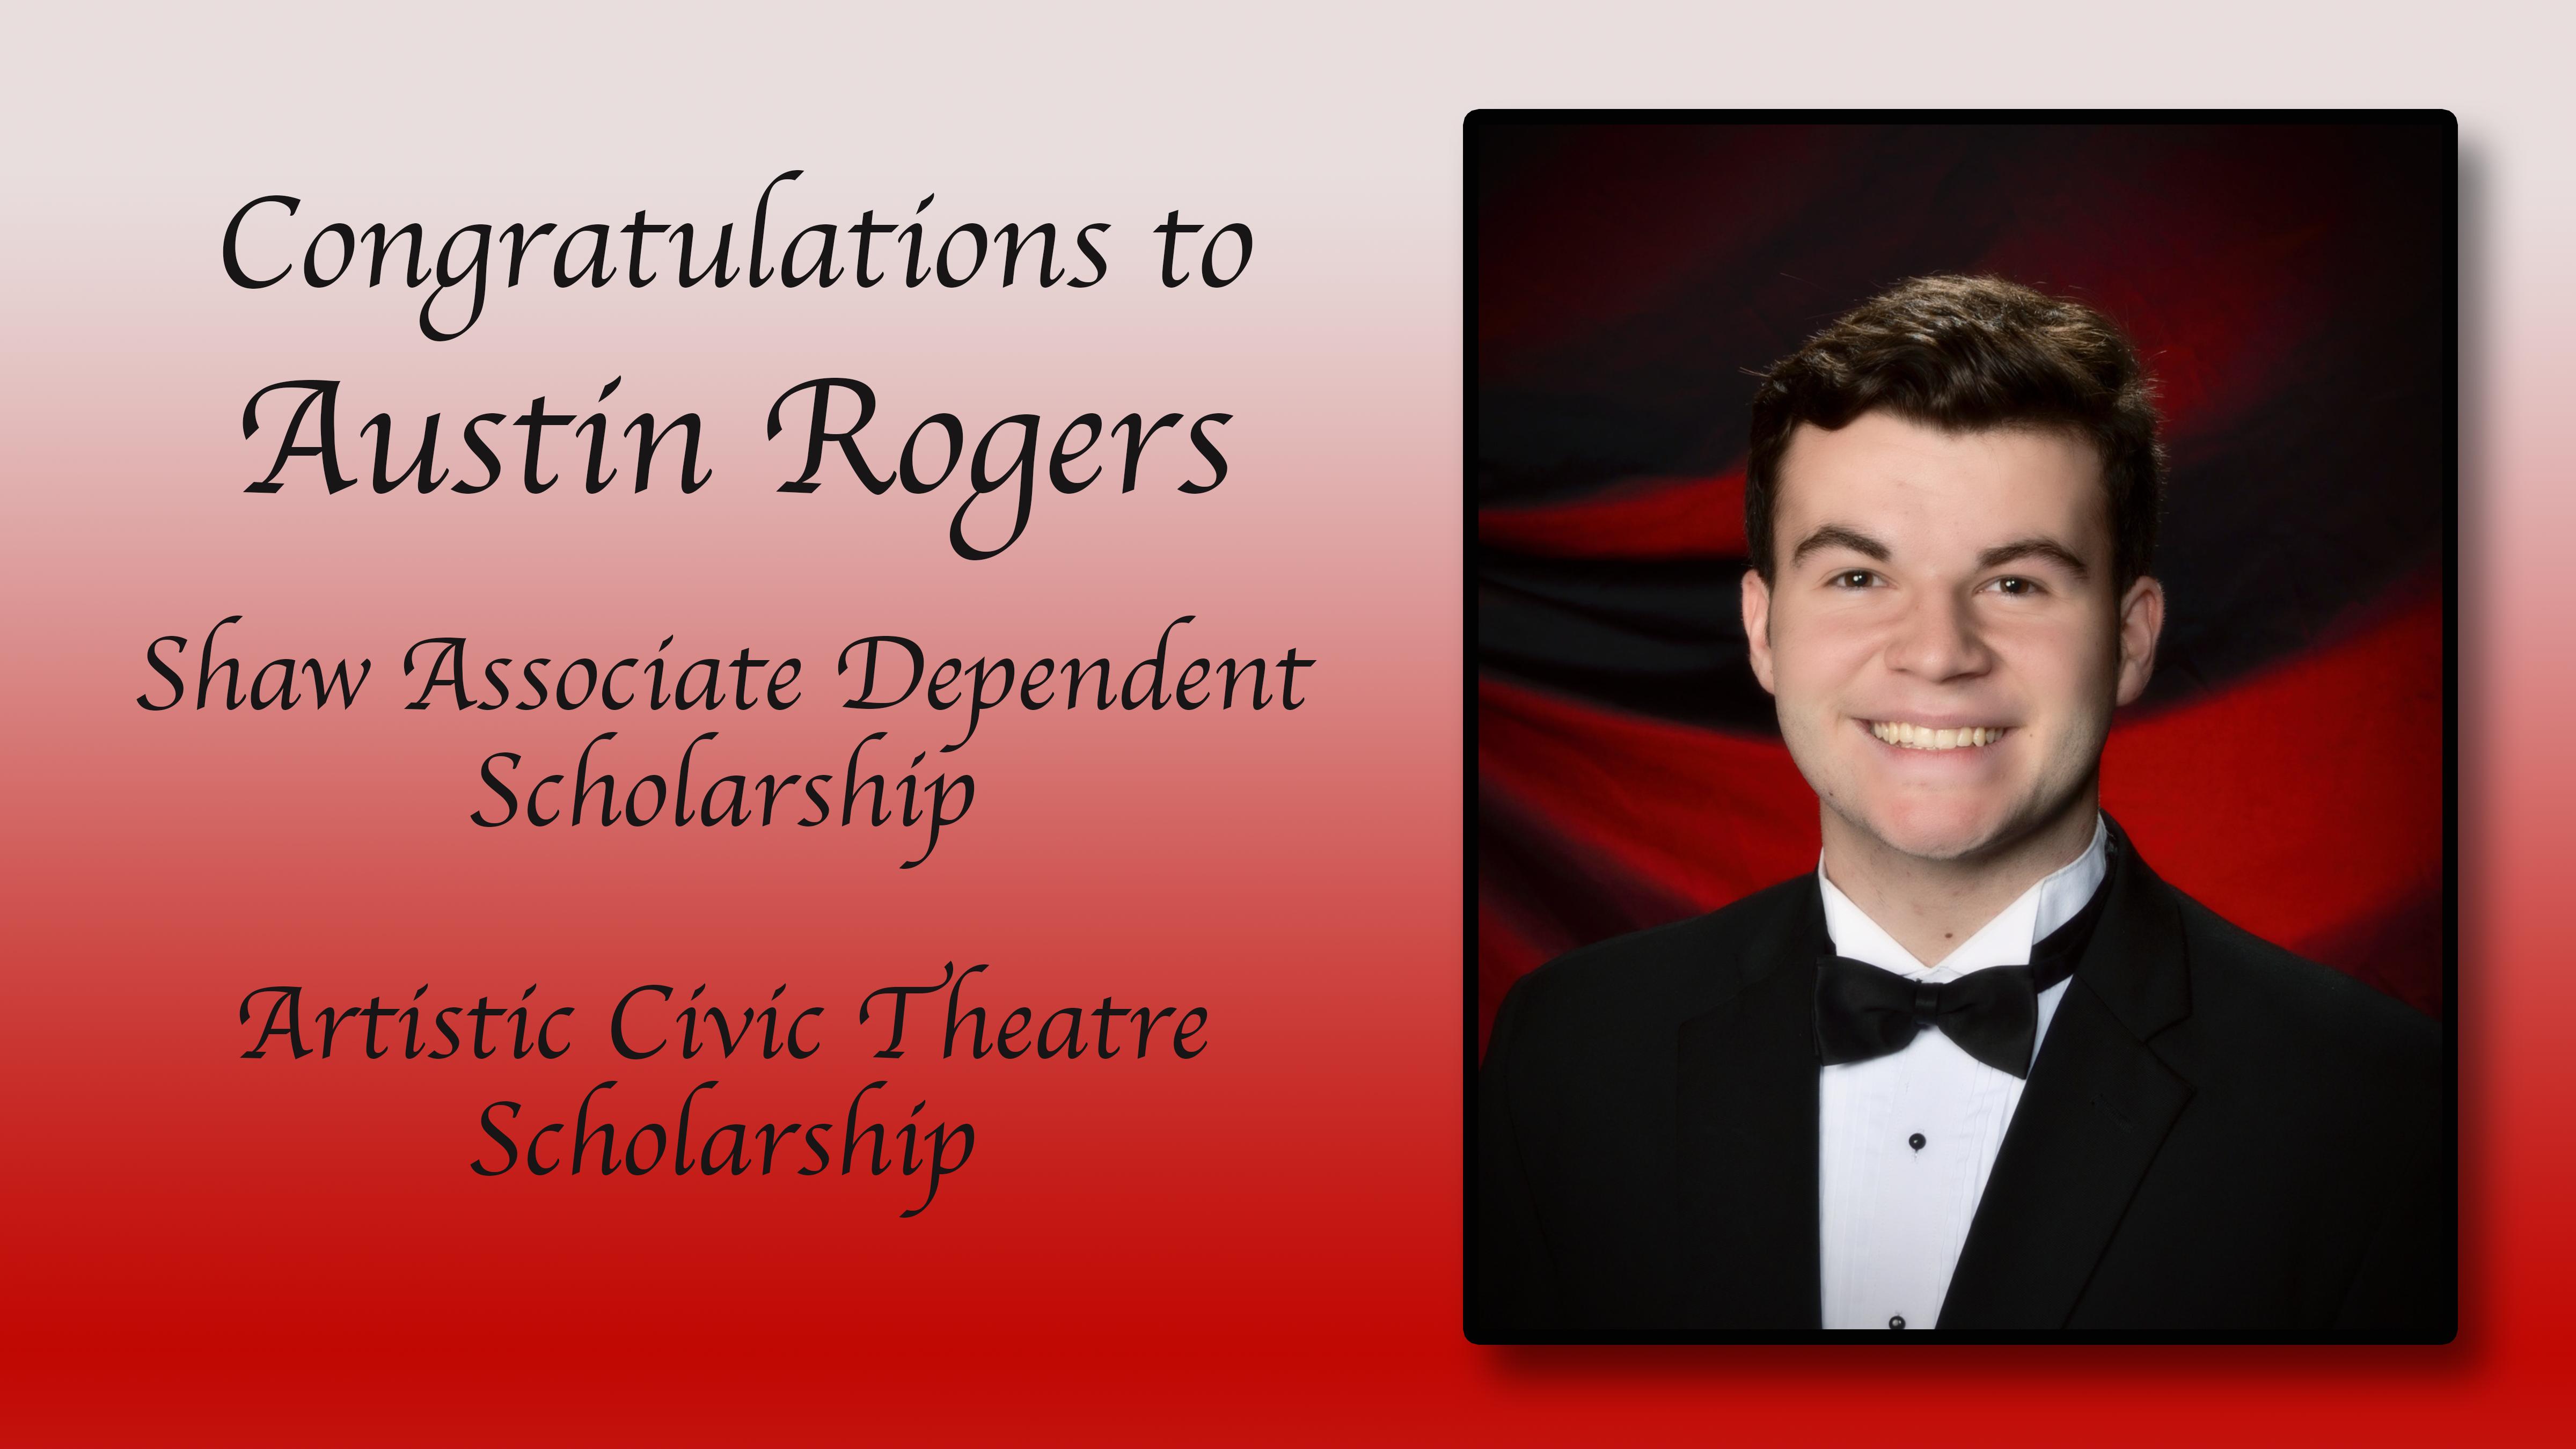 Austin Rogers Scholarships